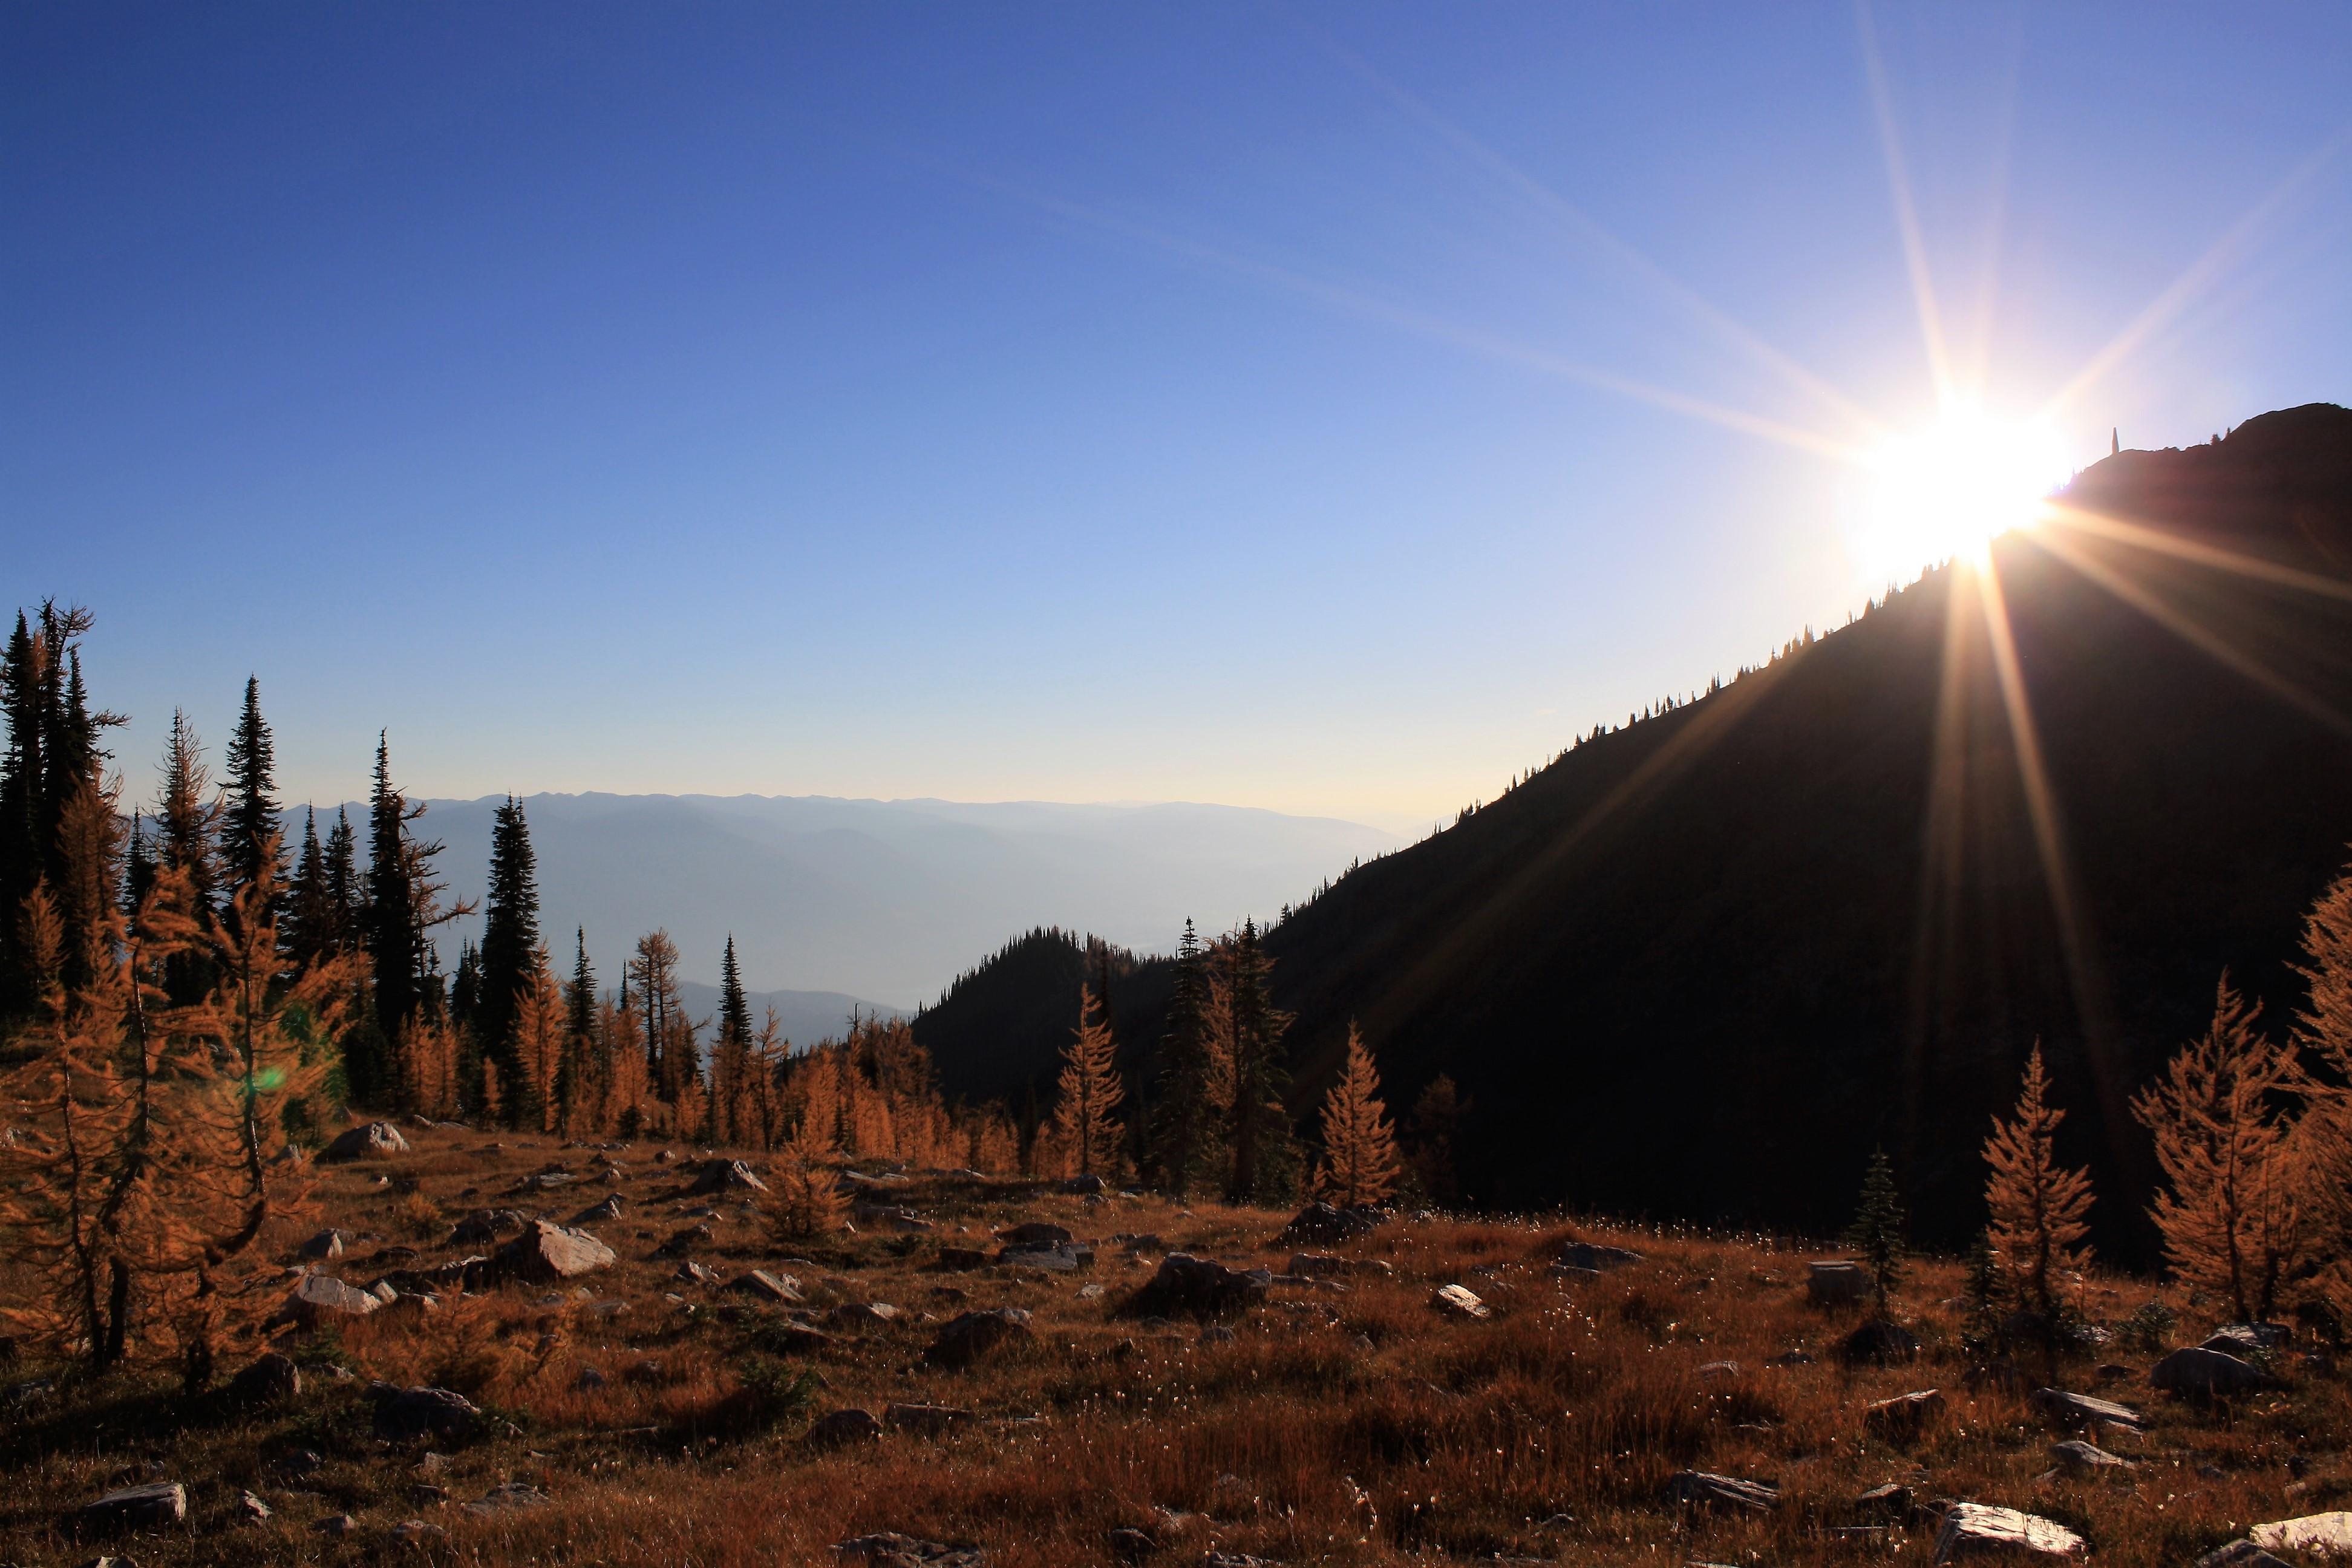 DM_nature_landscape_plaidlake_0523